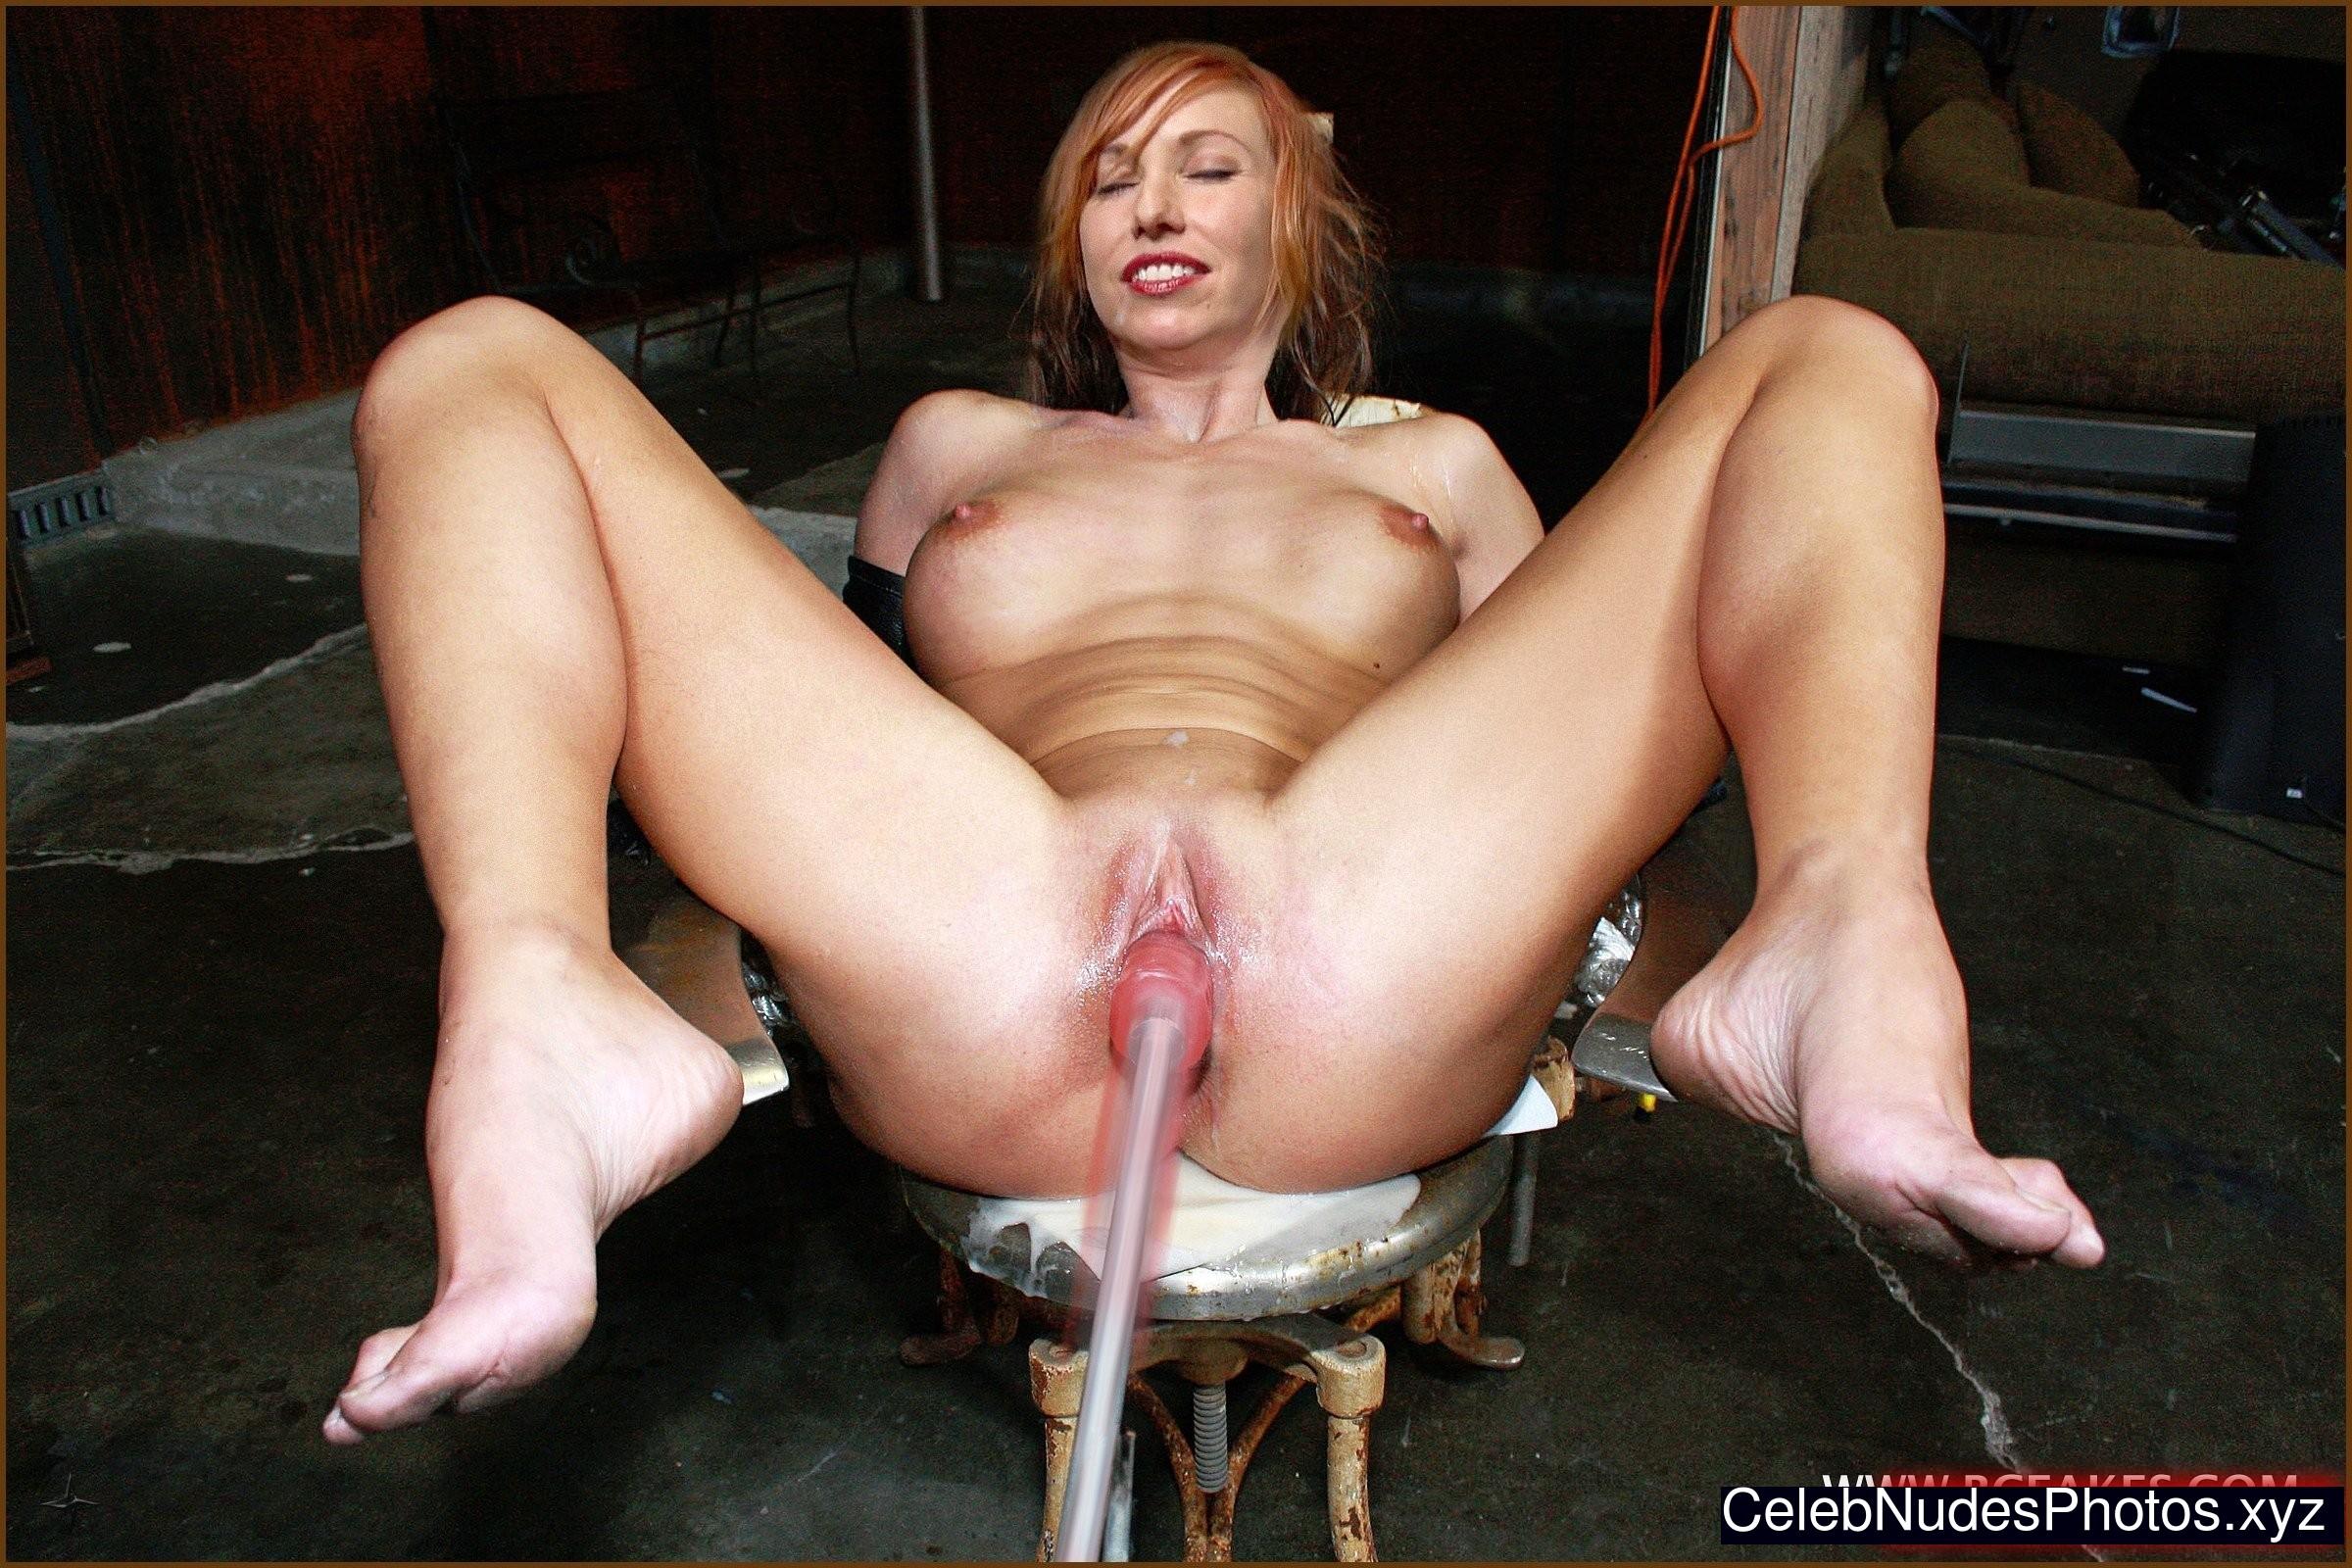 Kari byron nude porn